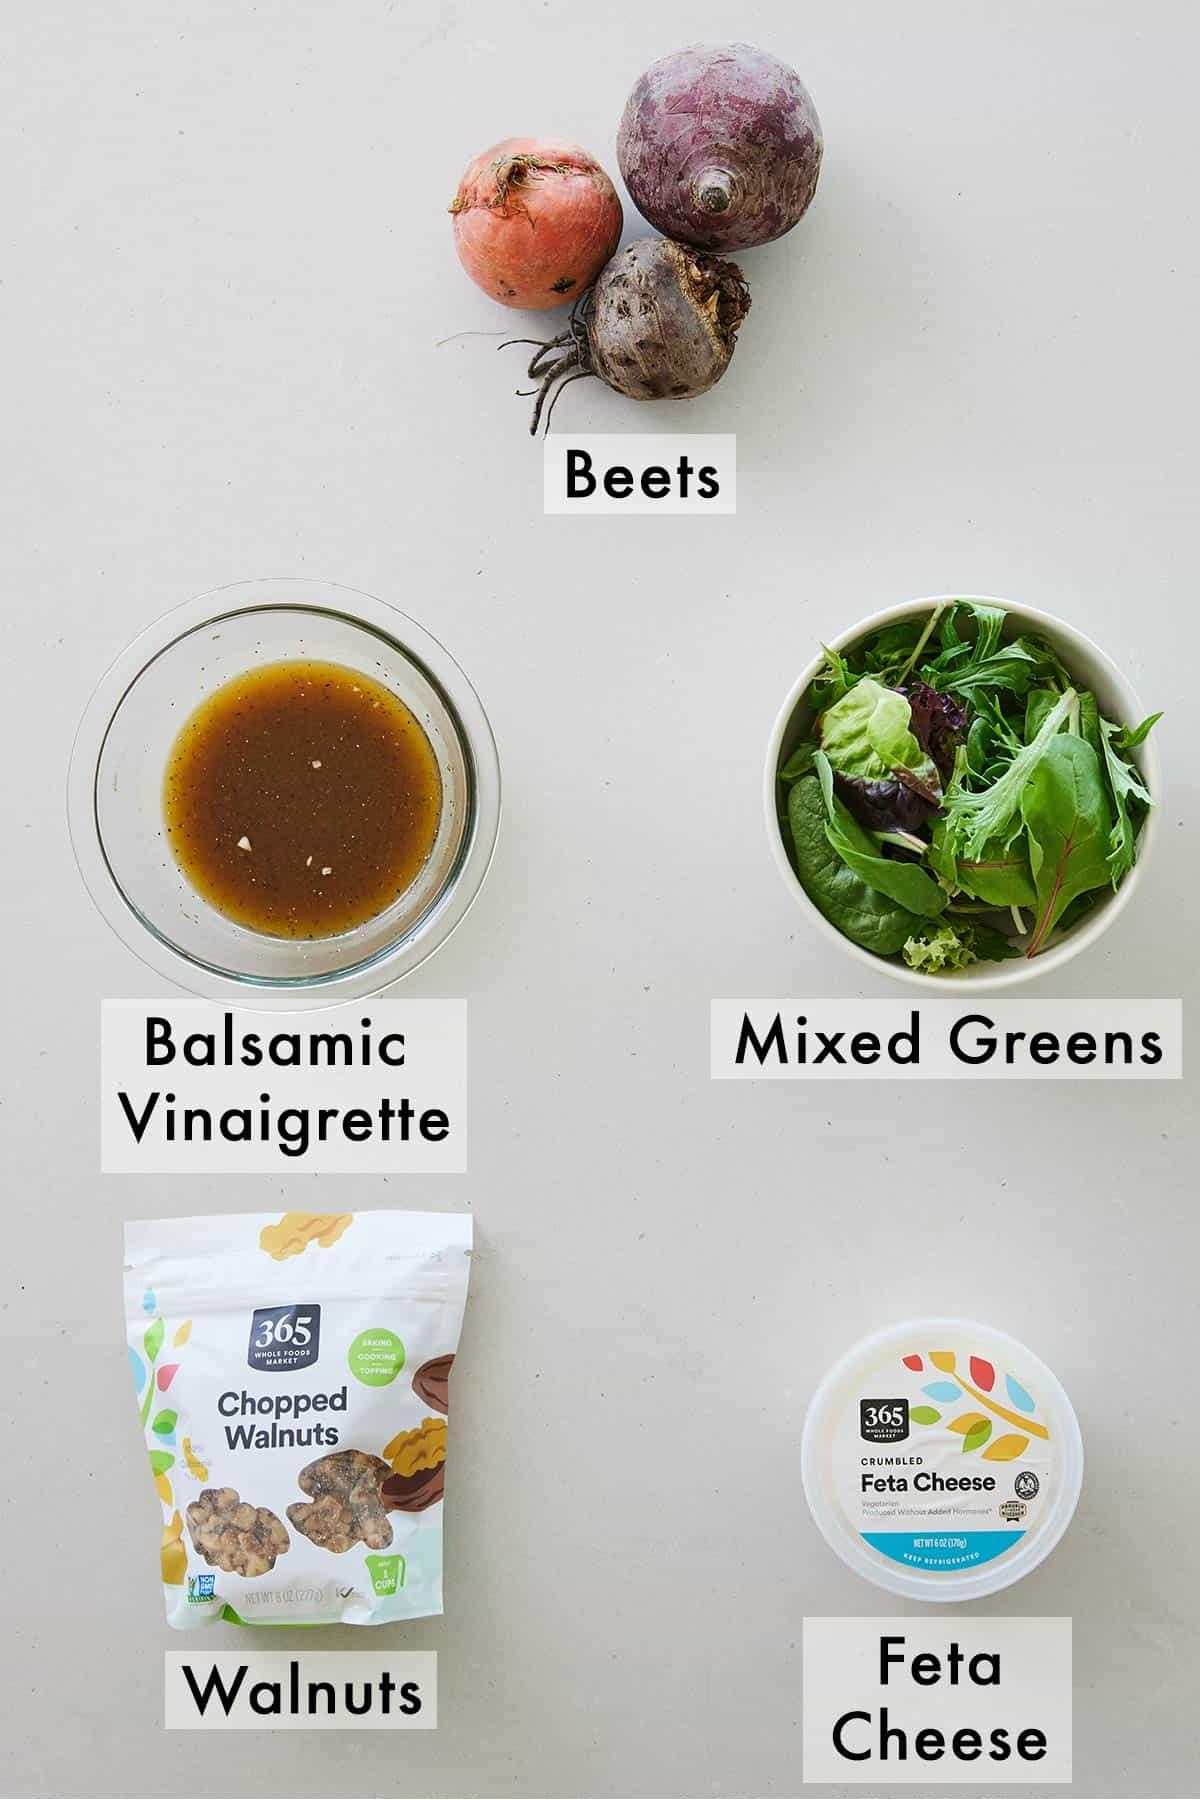 Ingredients needed to make a beet salad.